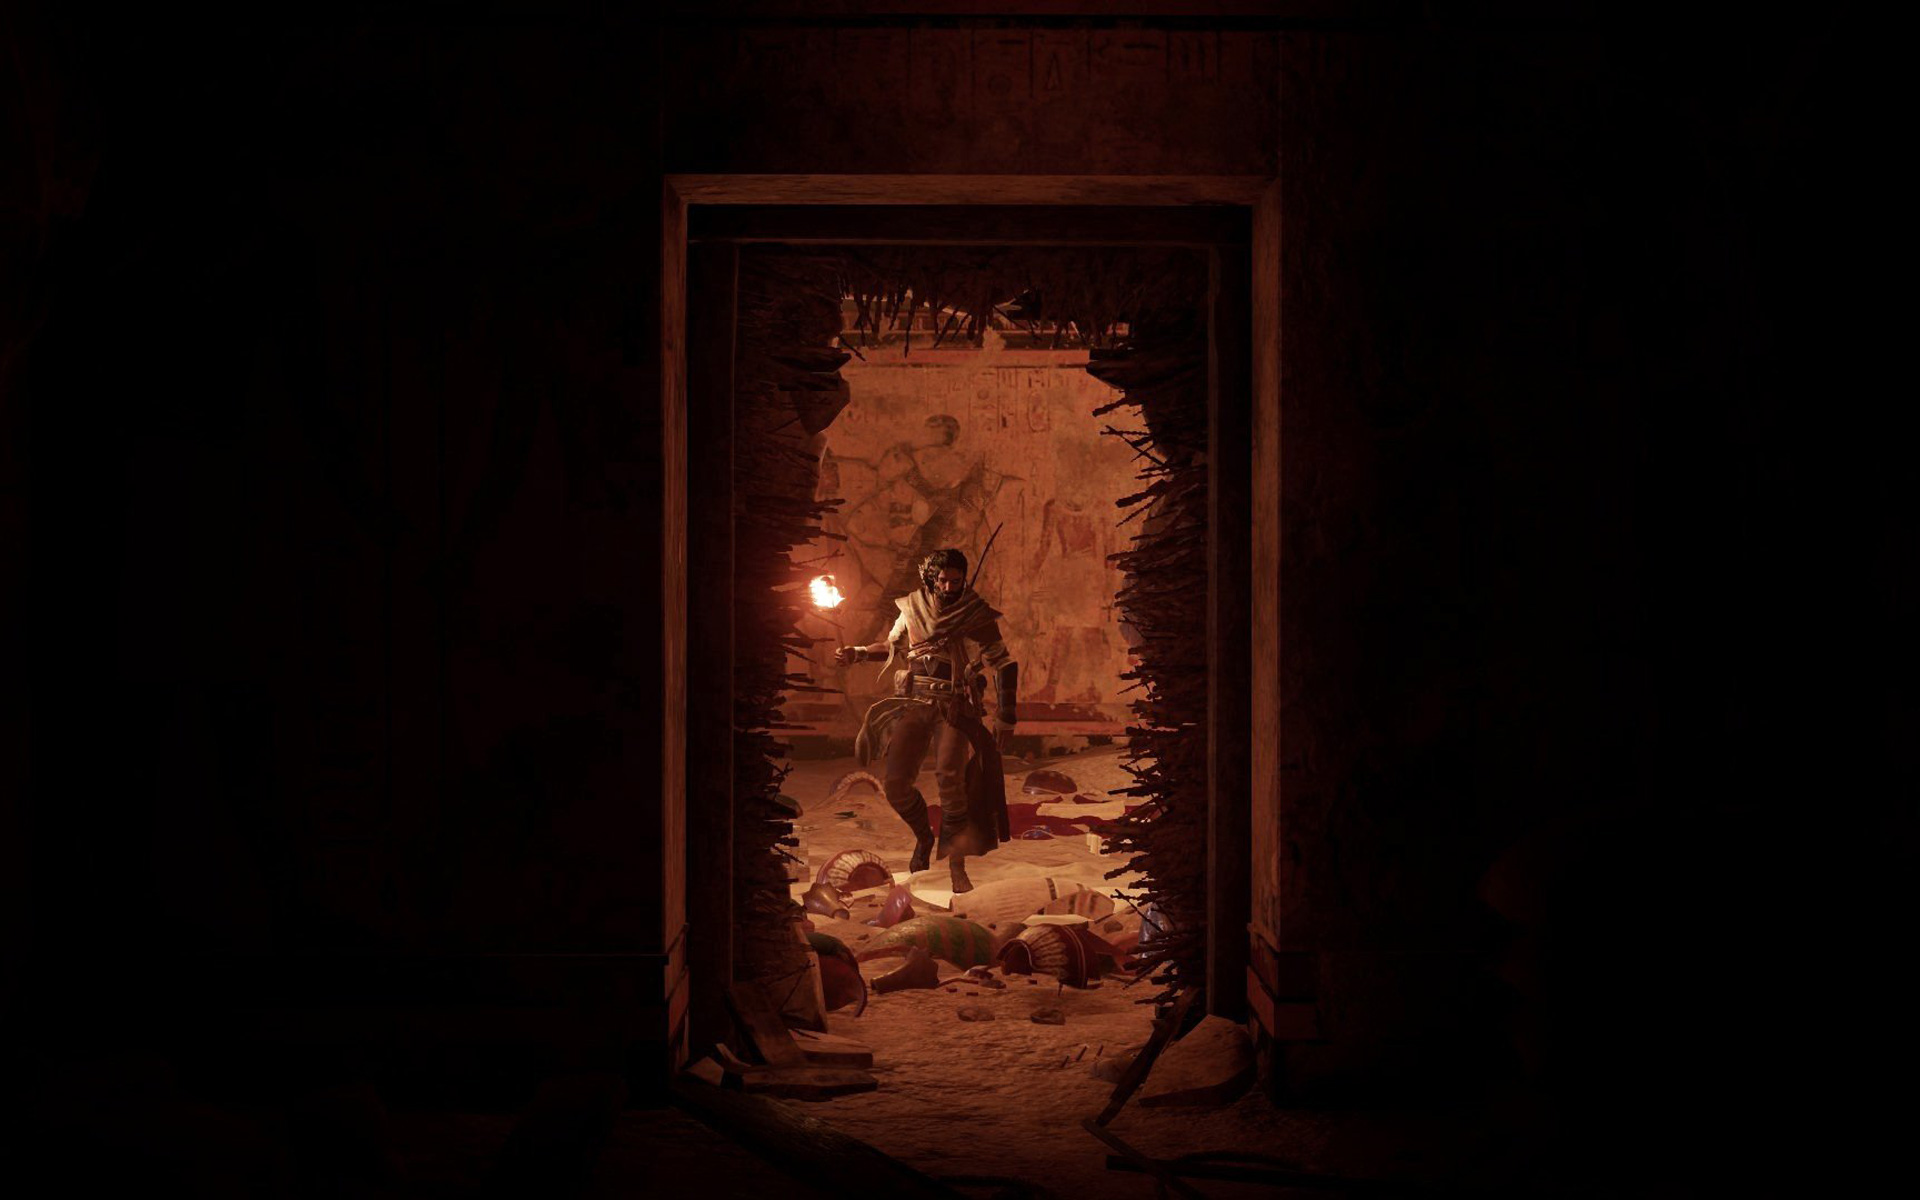 Assassin's Creed Origins Wallpaper in 1920x1200